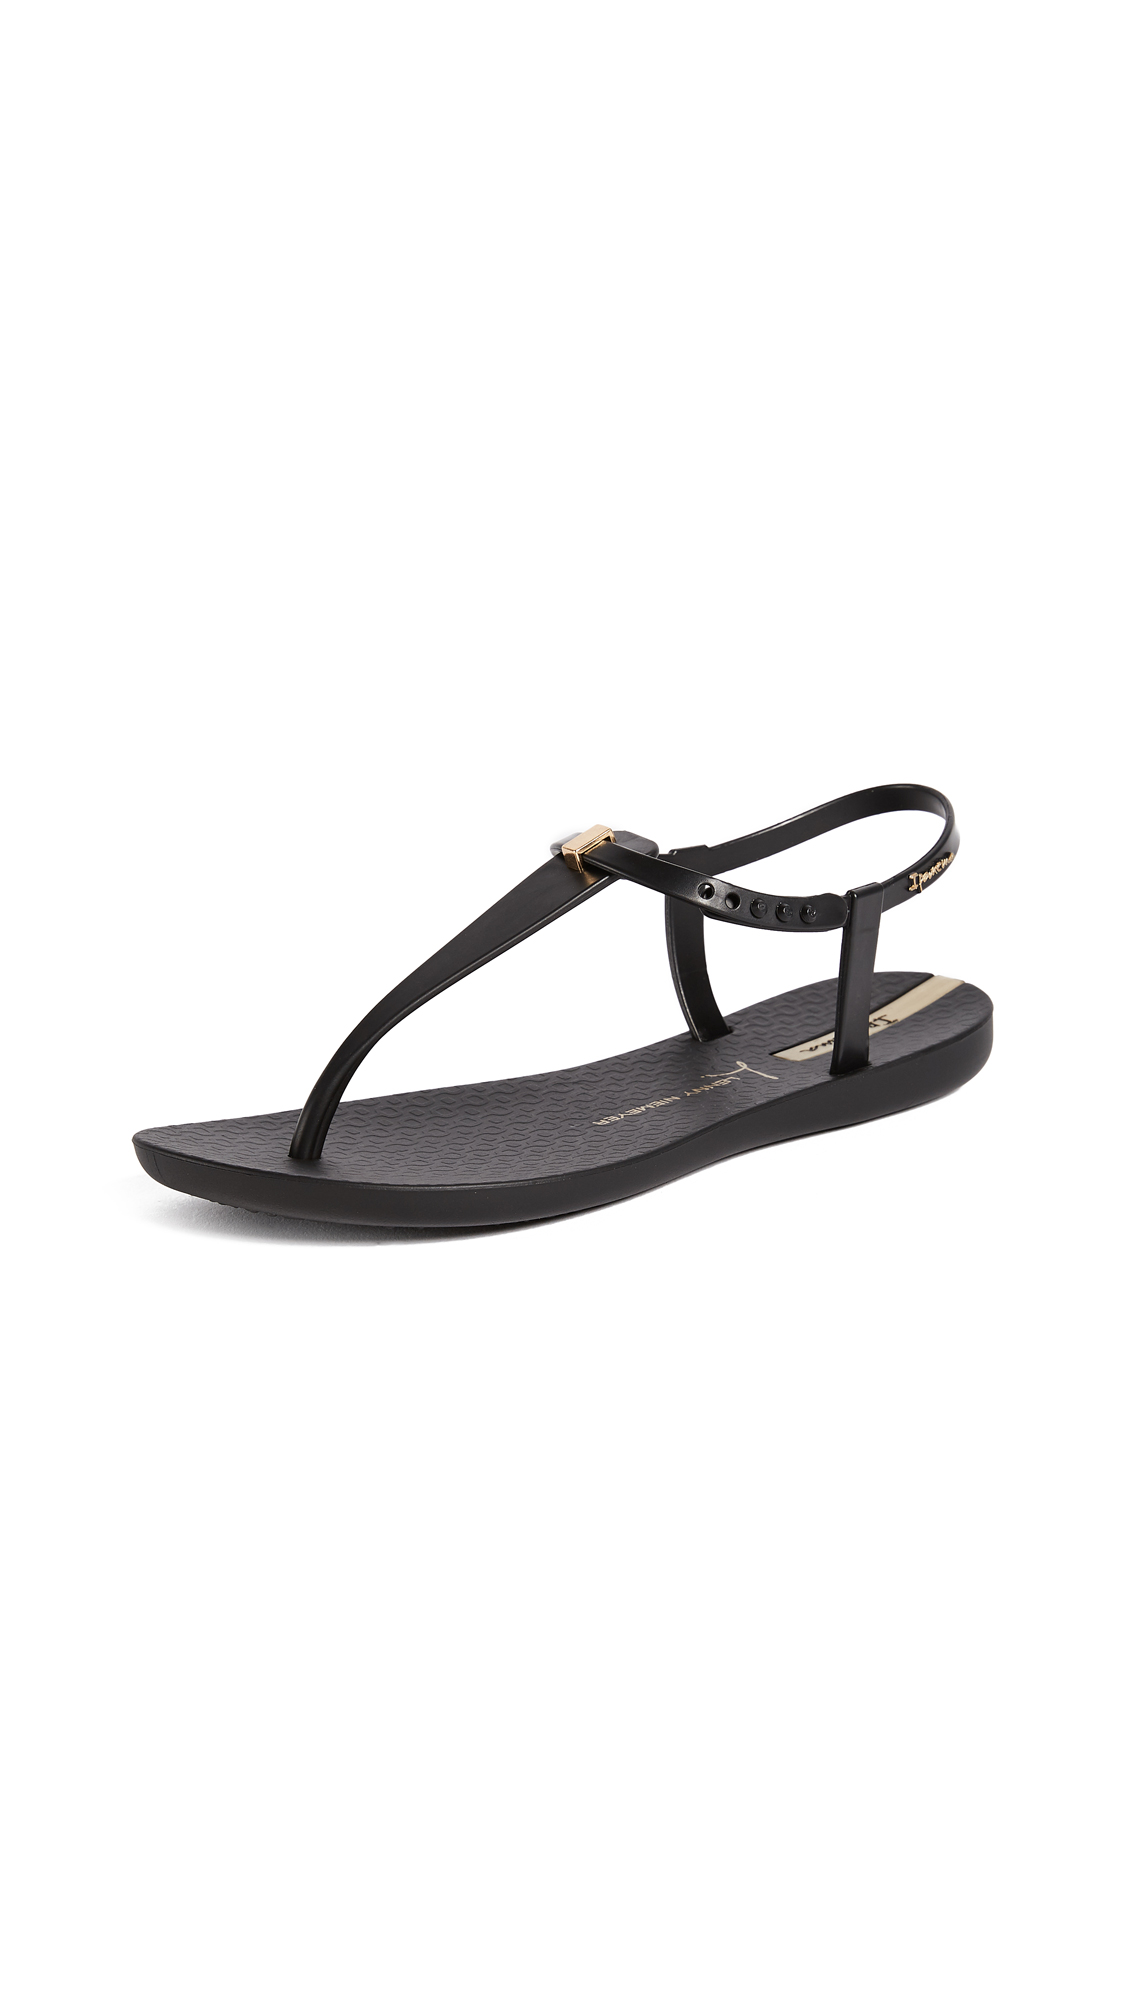 Ipanema Lenny Desire Sandals - Black